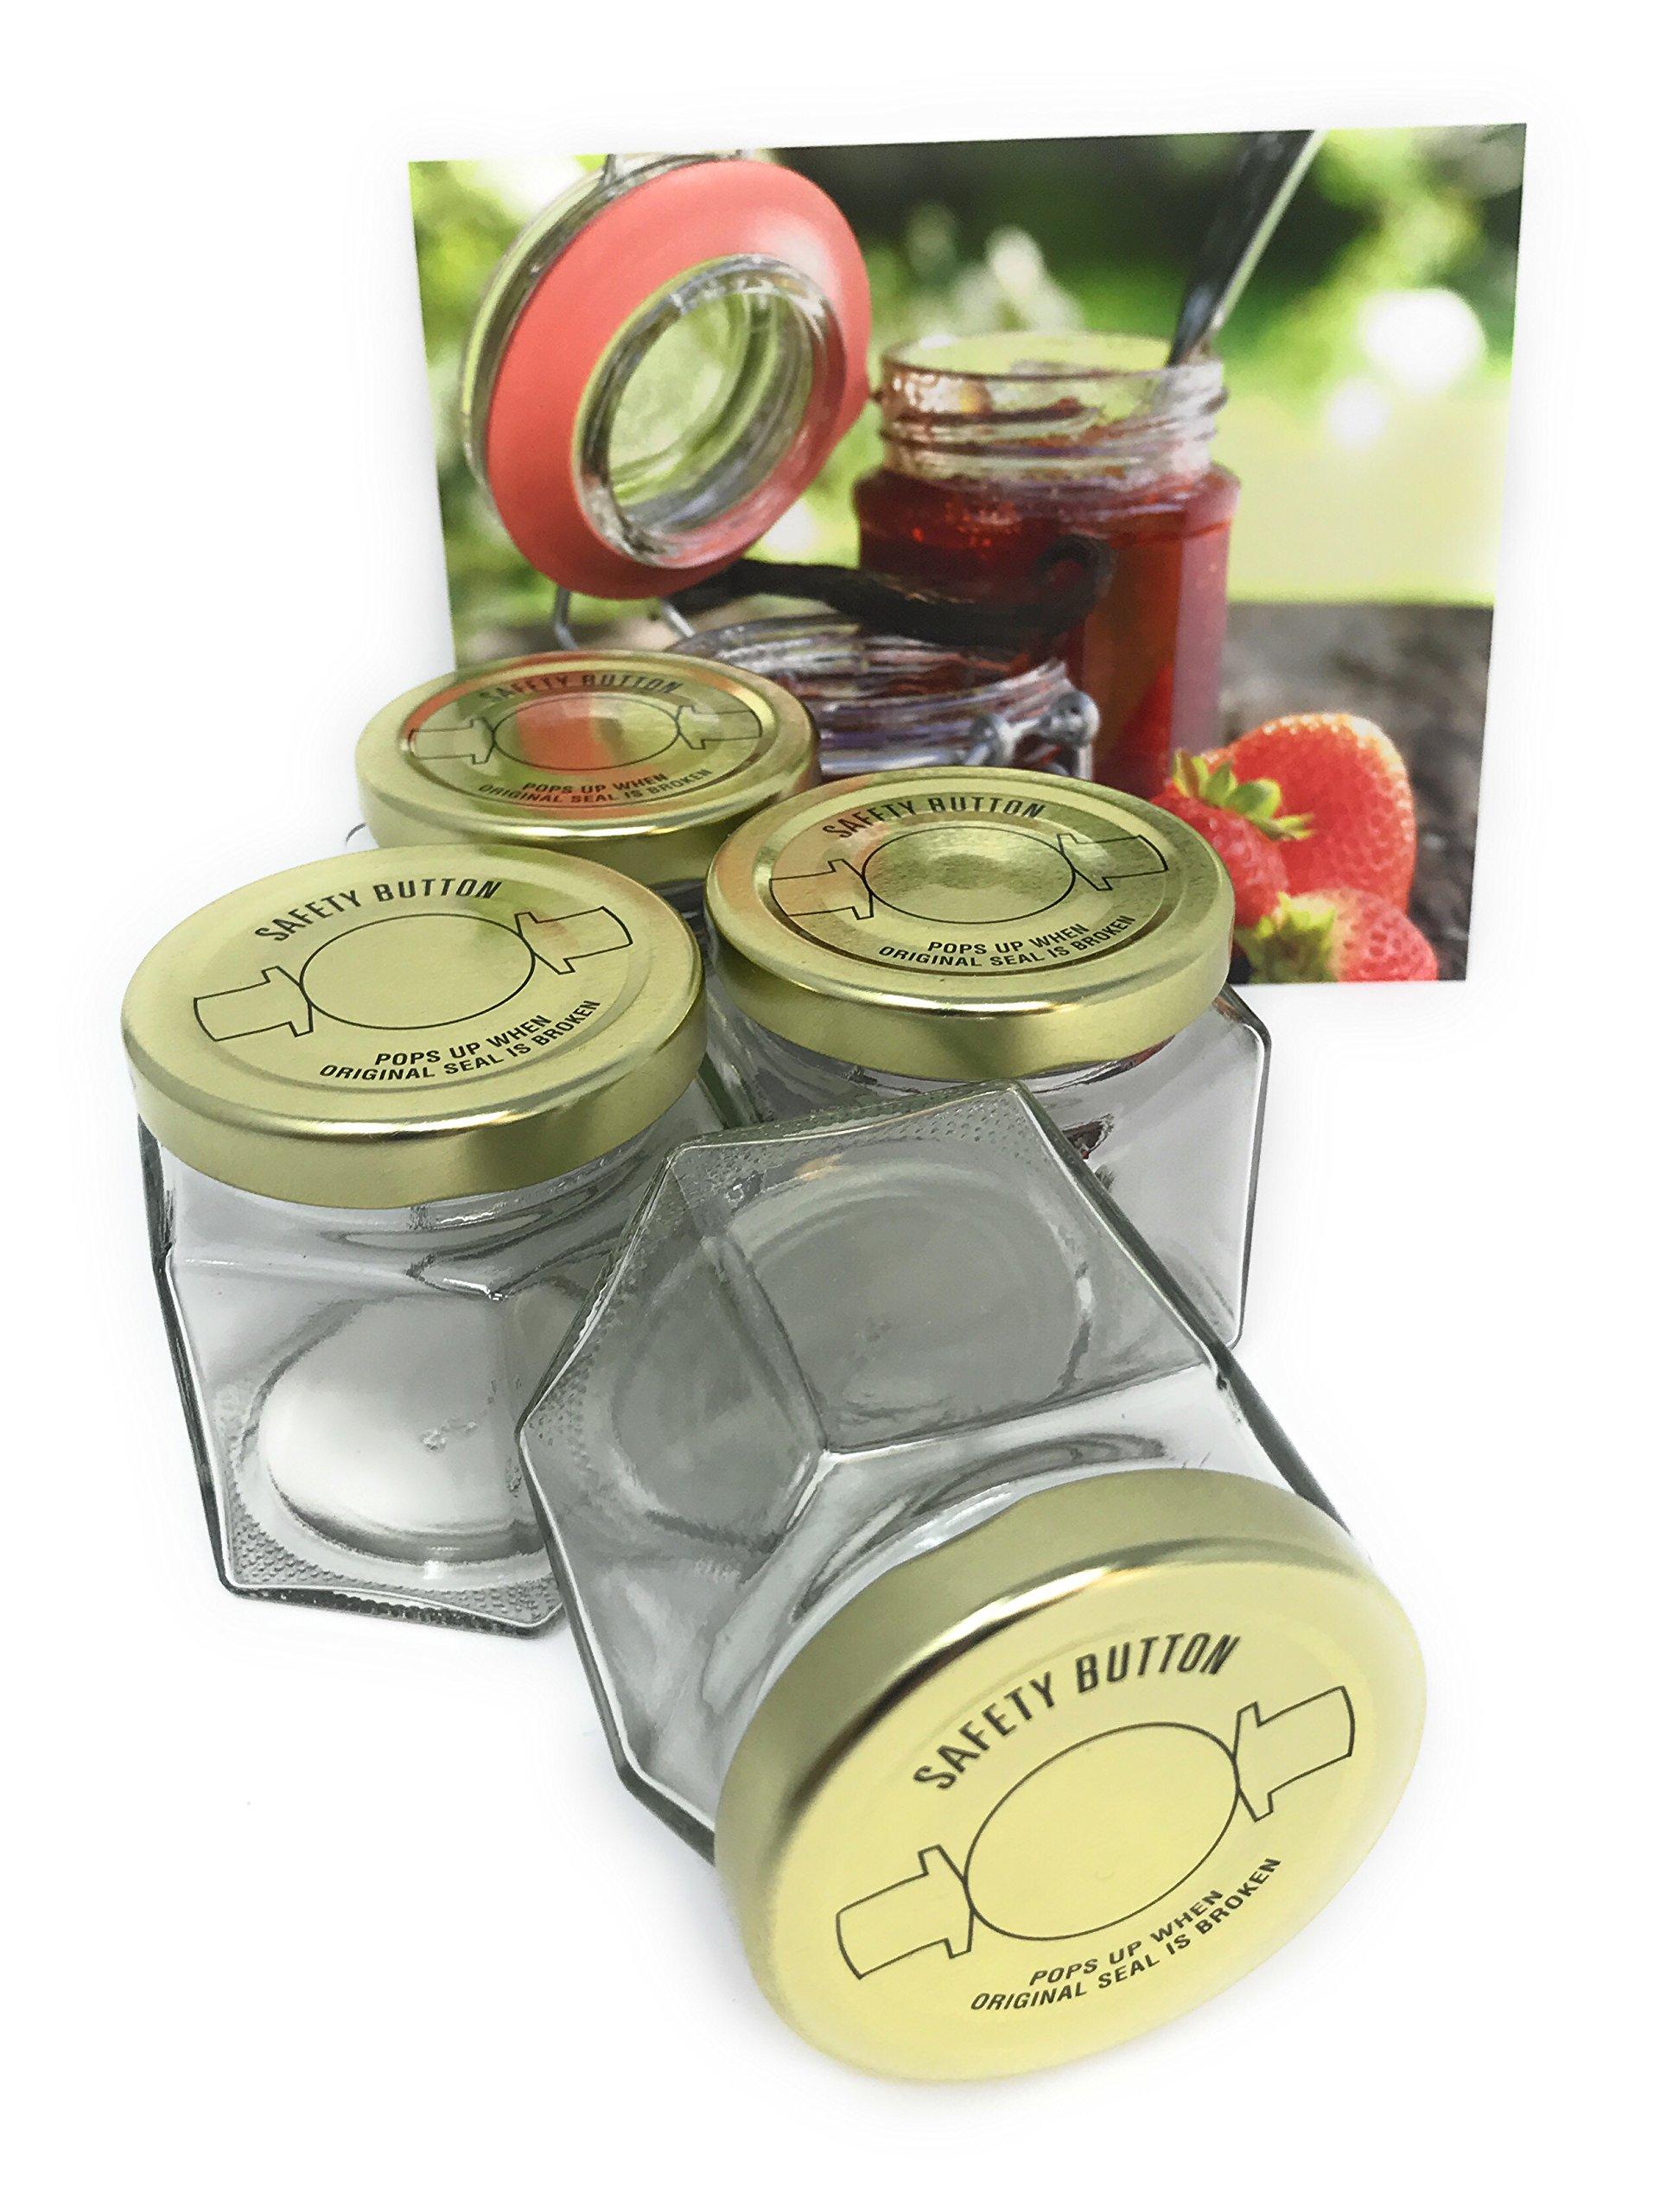 Strawberry Preserves Canning Kit Set of 4 Jars 3oz Recipe Card